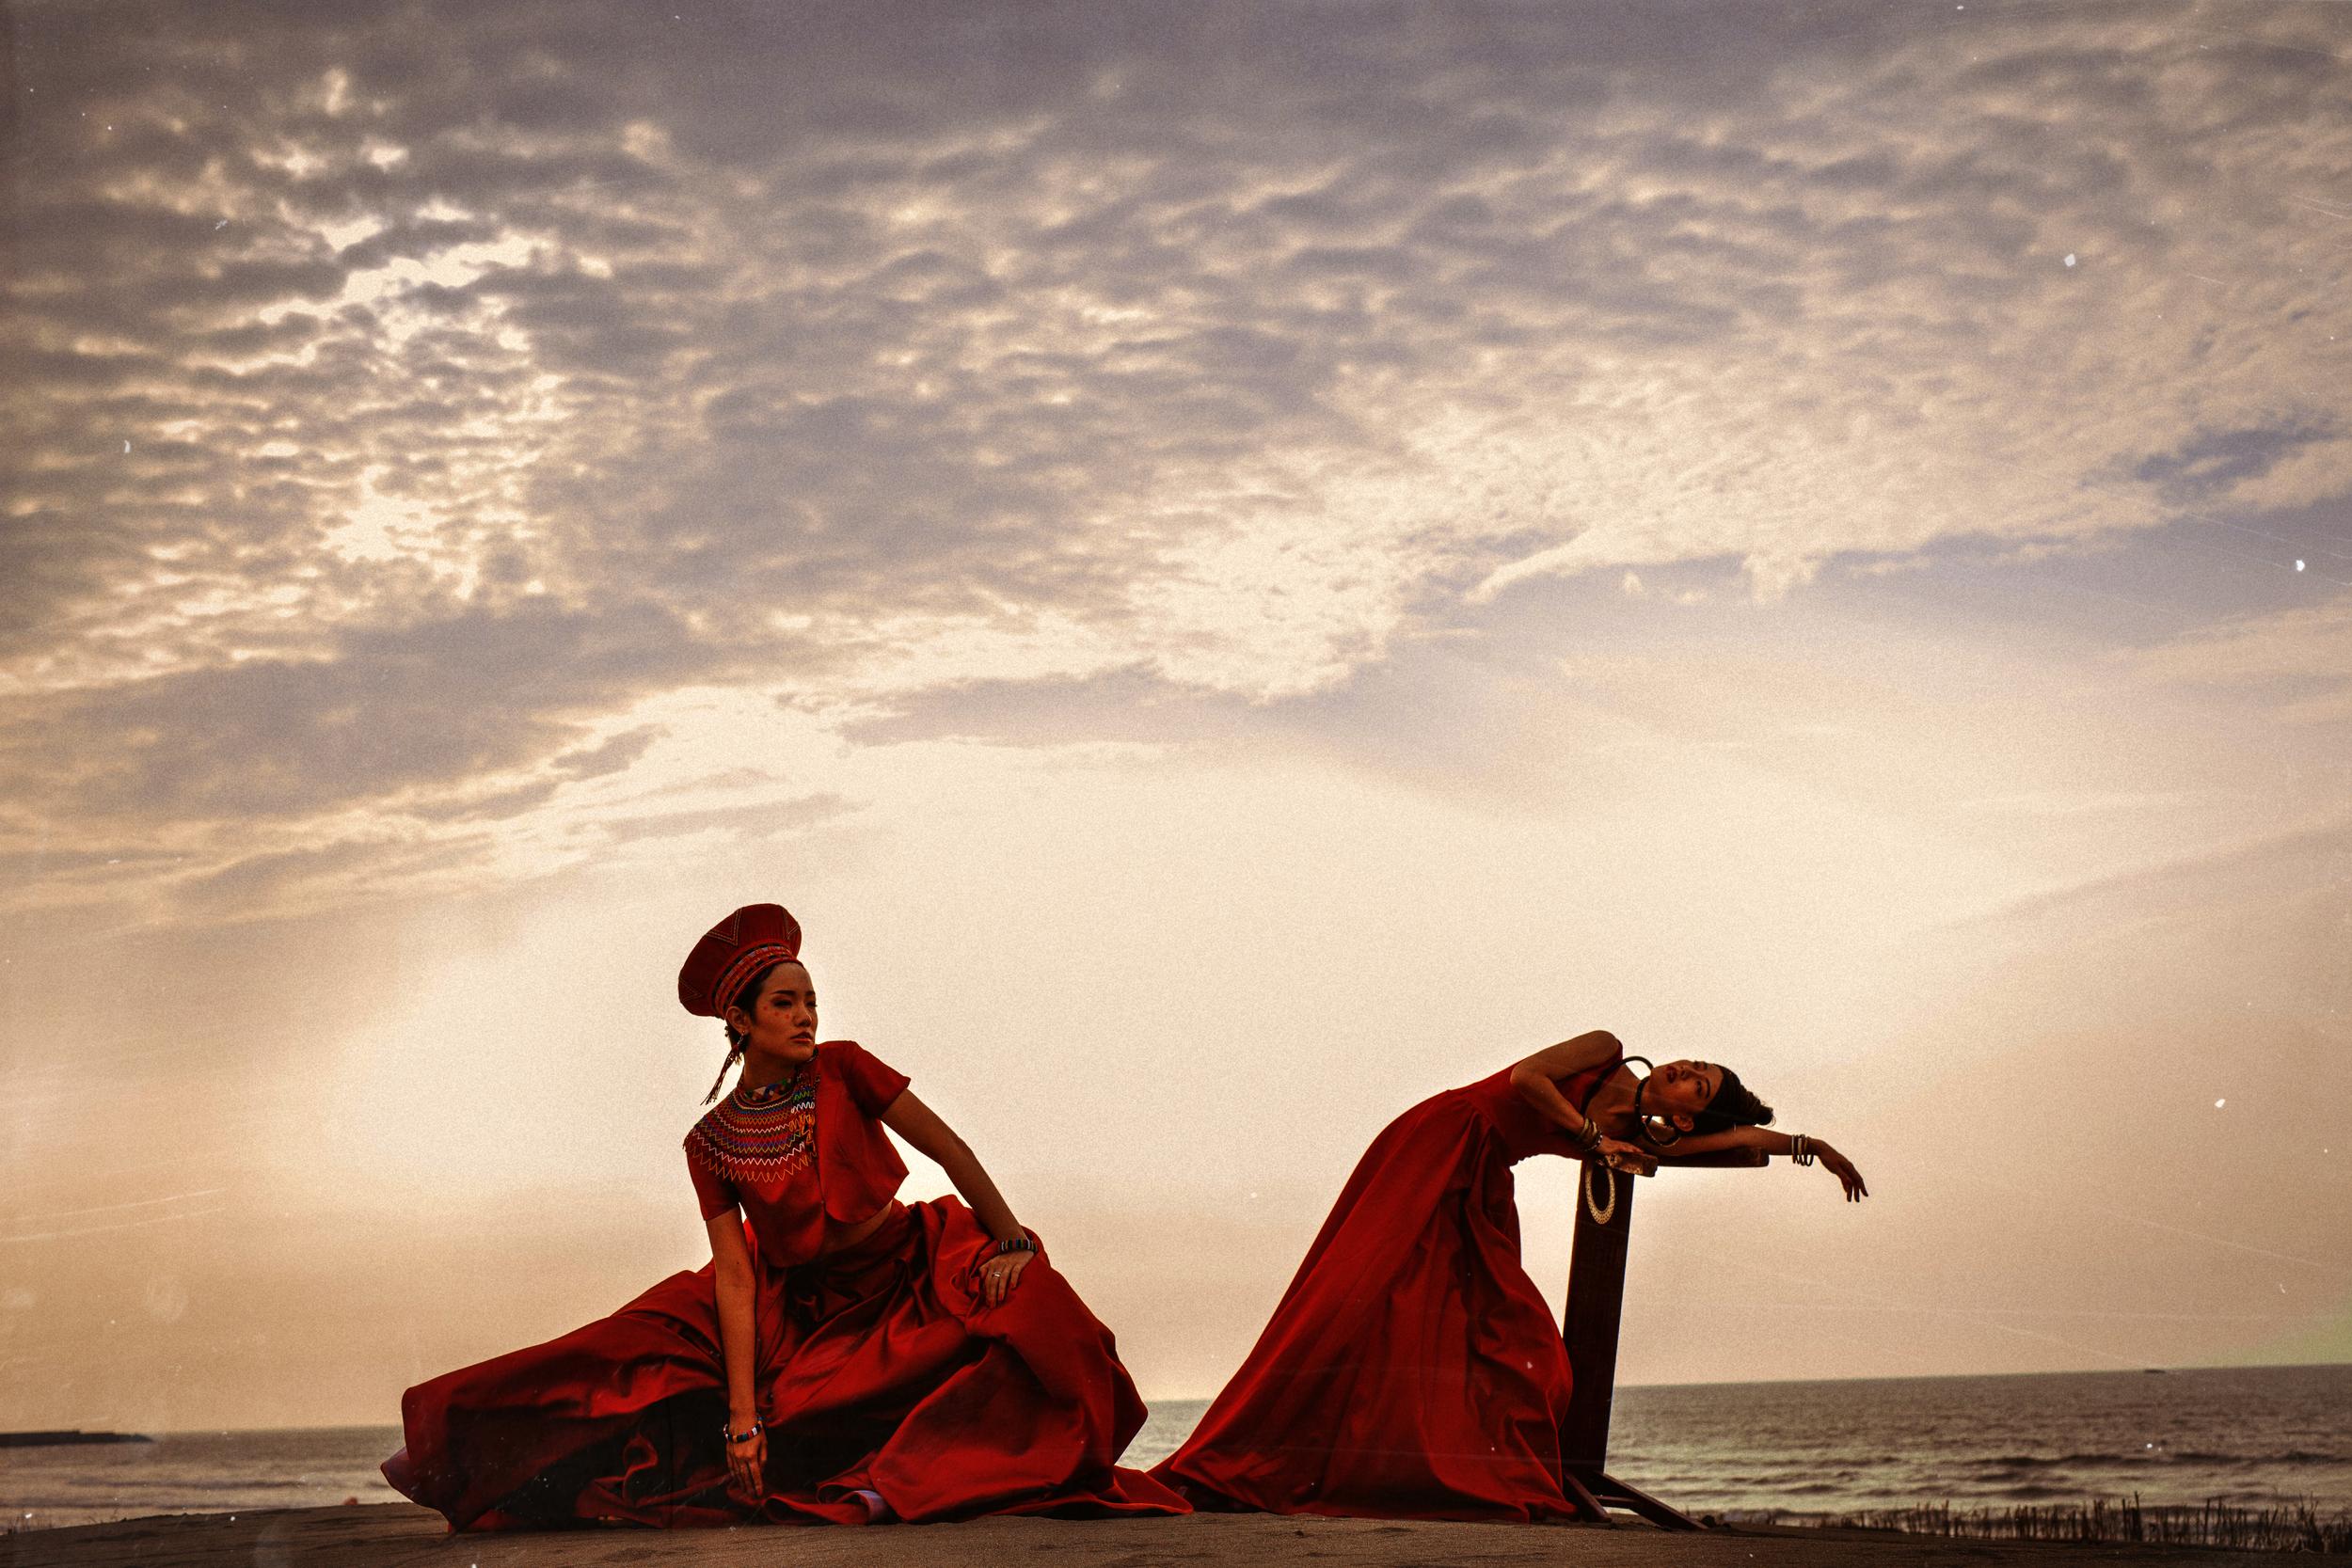 JC CREATIVE 周頴賢 女性婚攝 婚紗推薦 自主婚紗 棚拍婚紗 PREWEDDING 影像創作 藝術家 ART FINE ART自然風格  黑白照 ART_00006.jpg